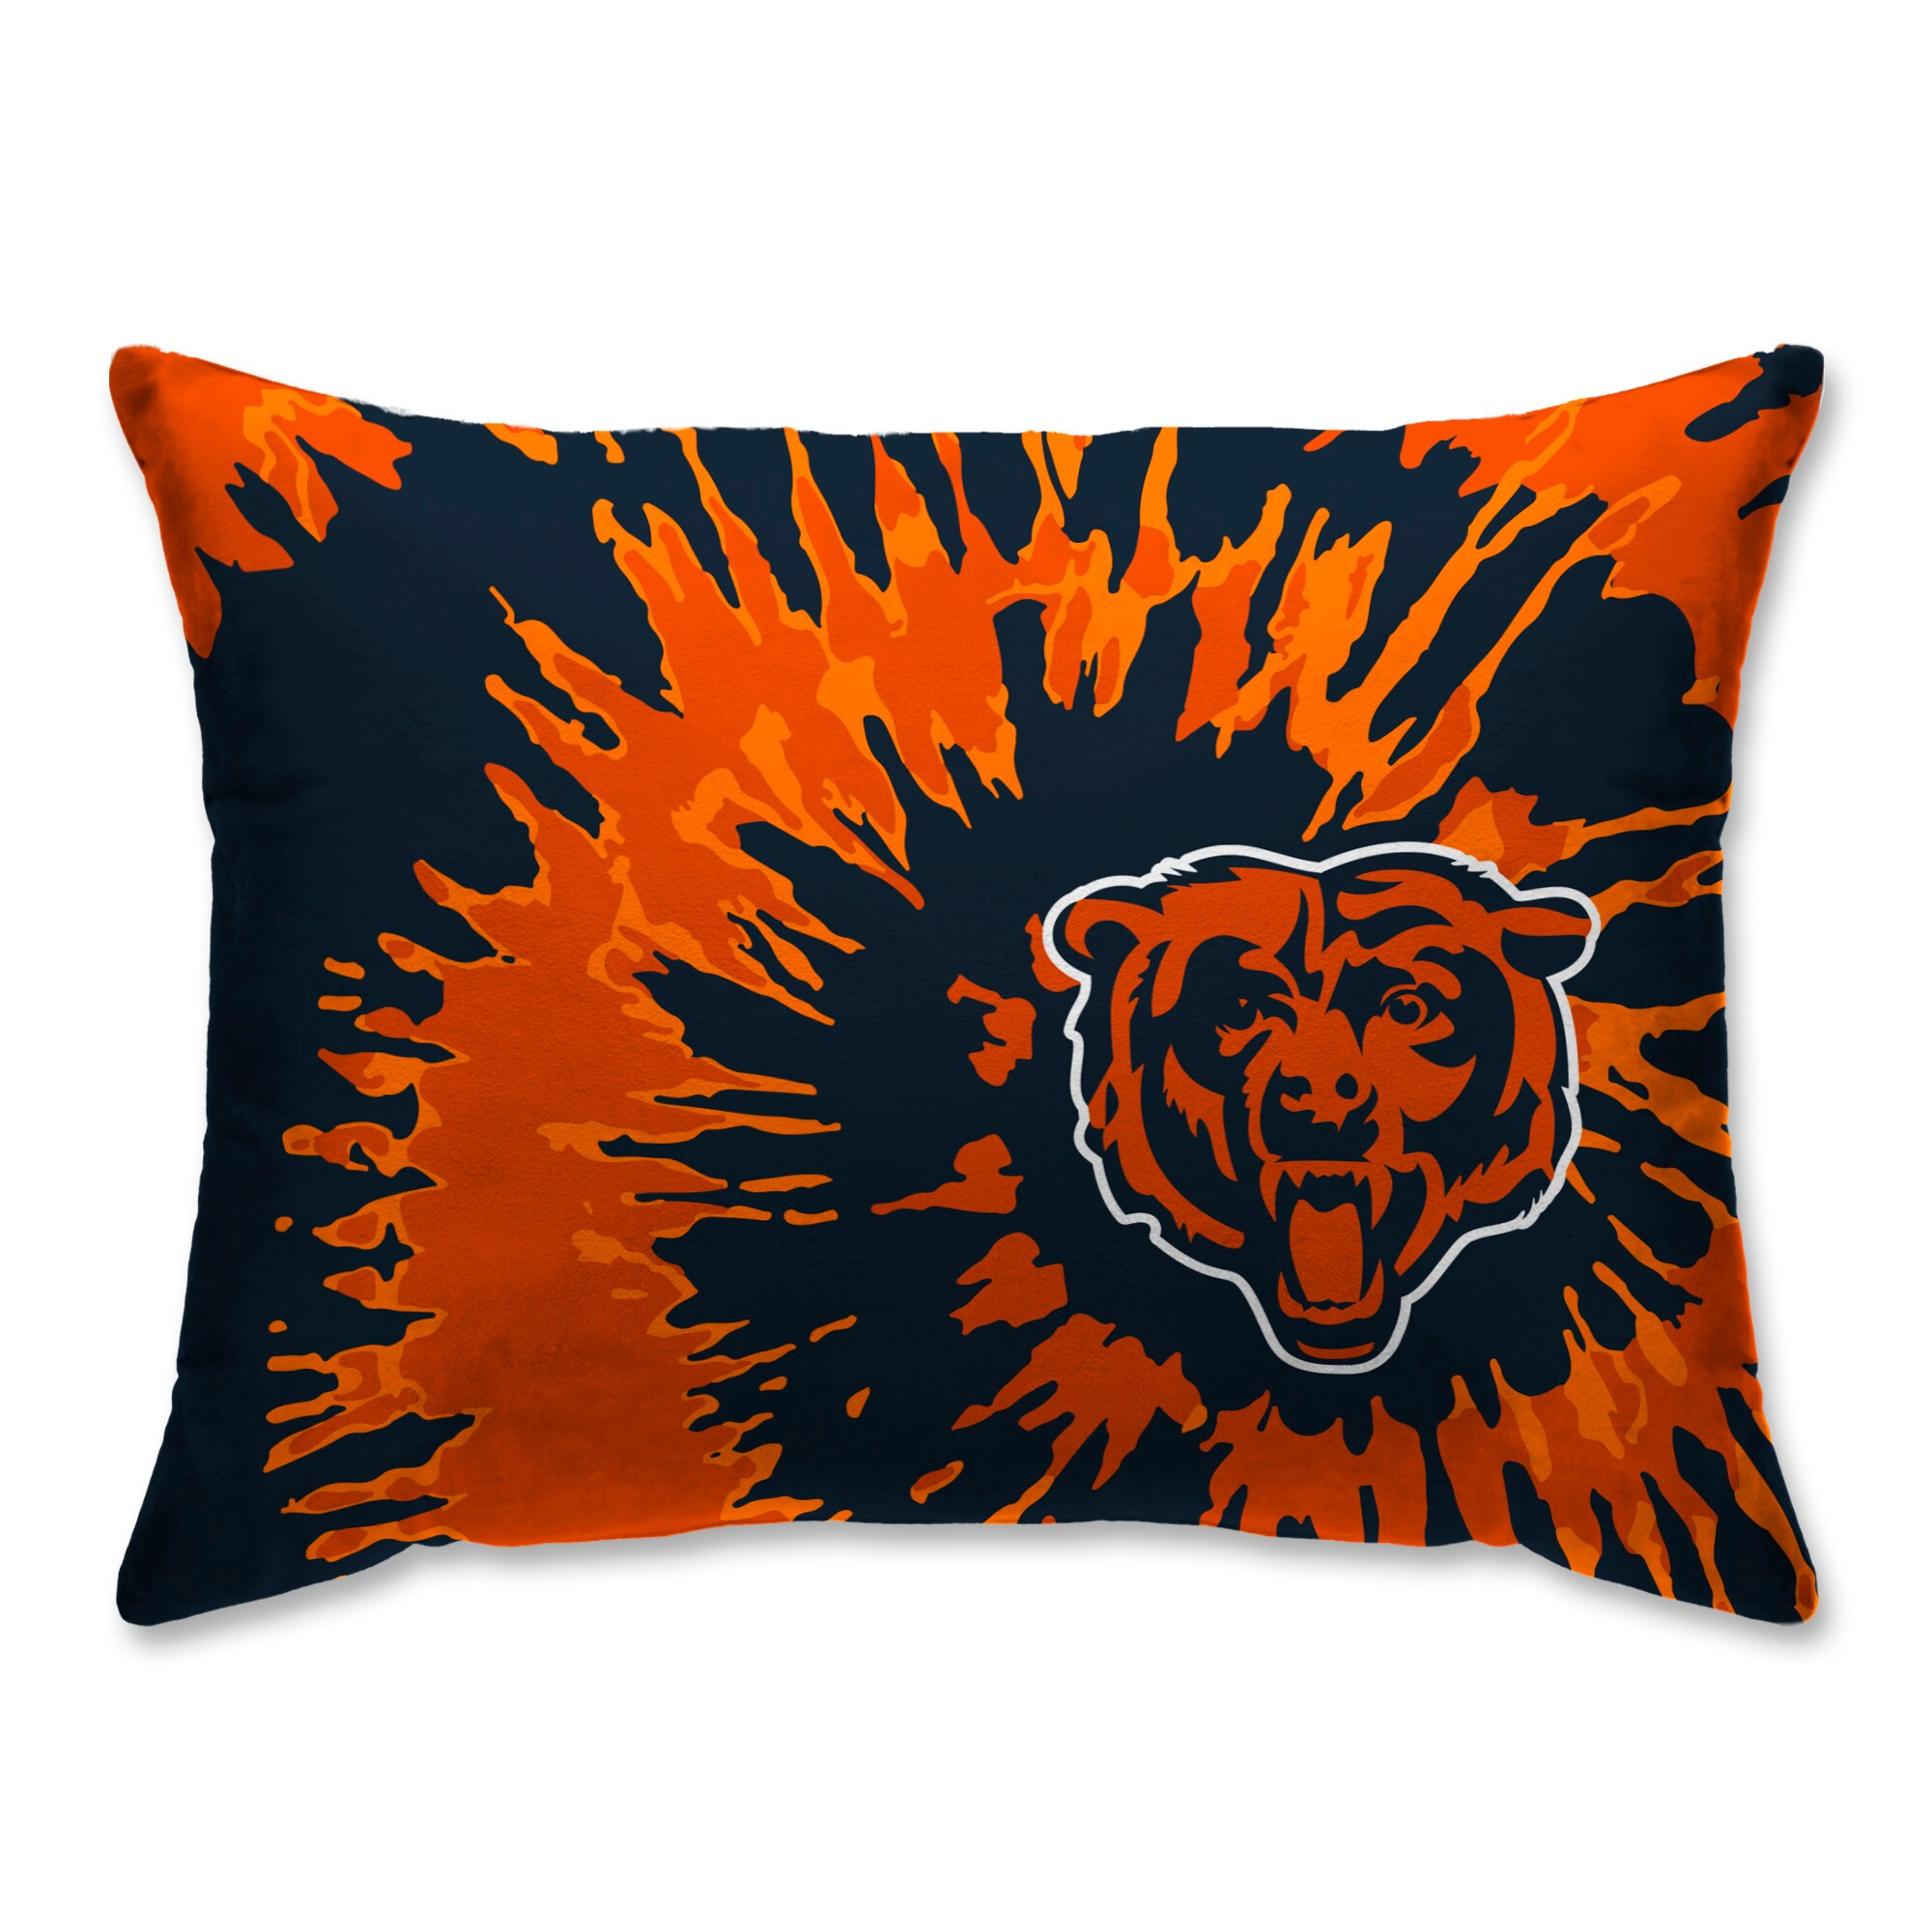 Chicago Bears Tie Dye Plush Bed Pillow - Blue